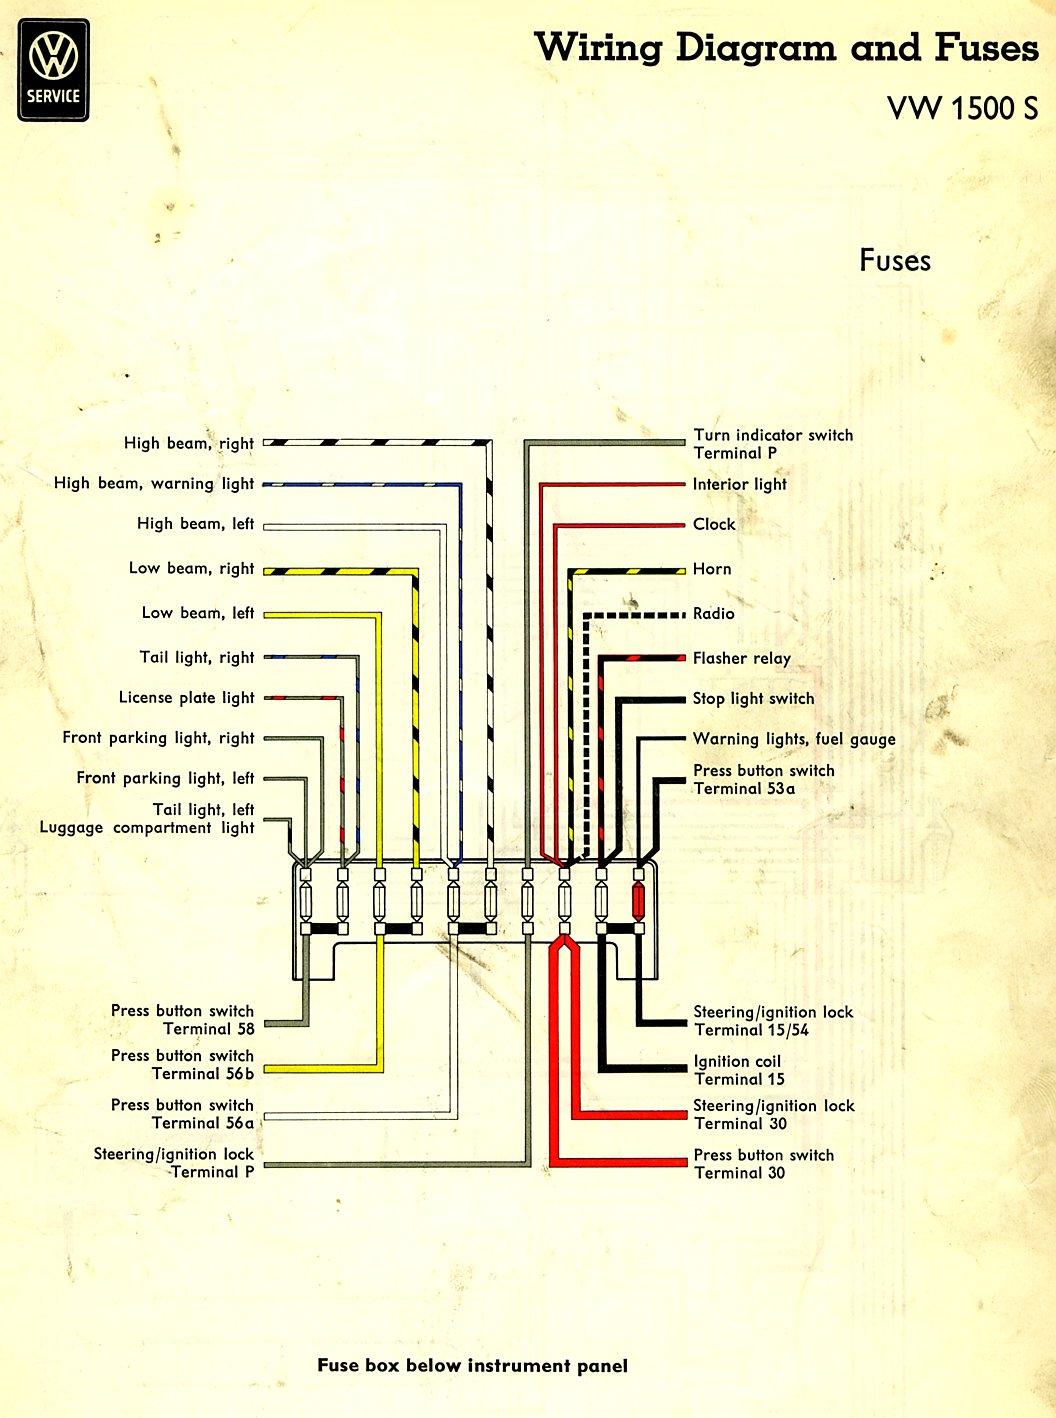 1968 Vw Bug Wiring Diagram Wiring Harness